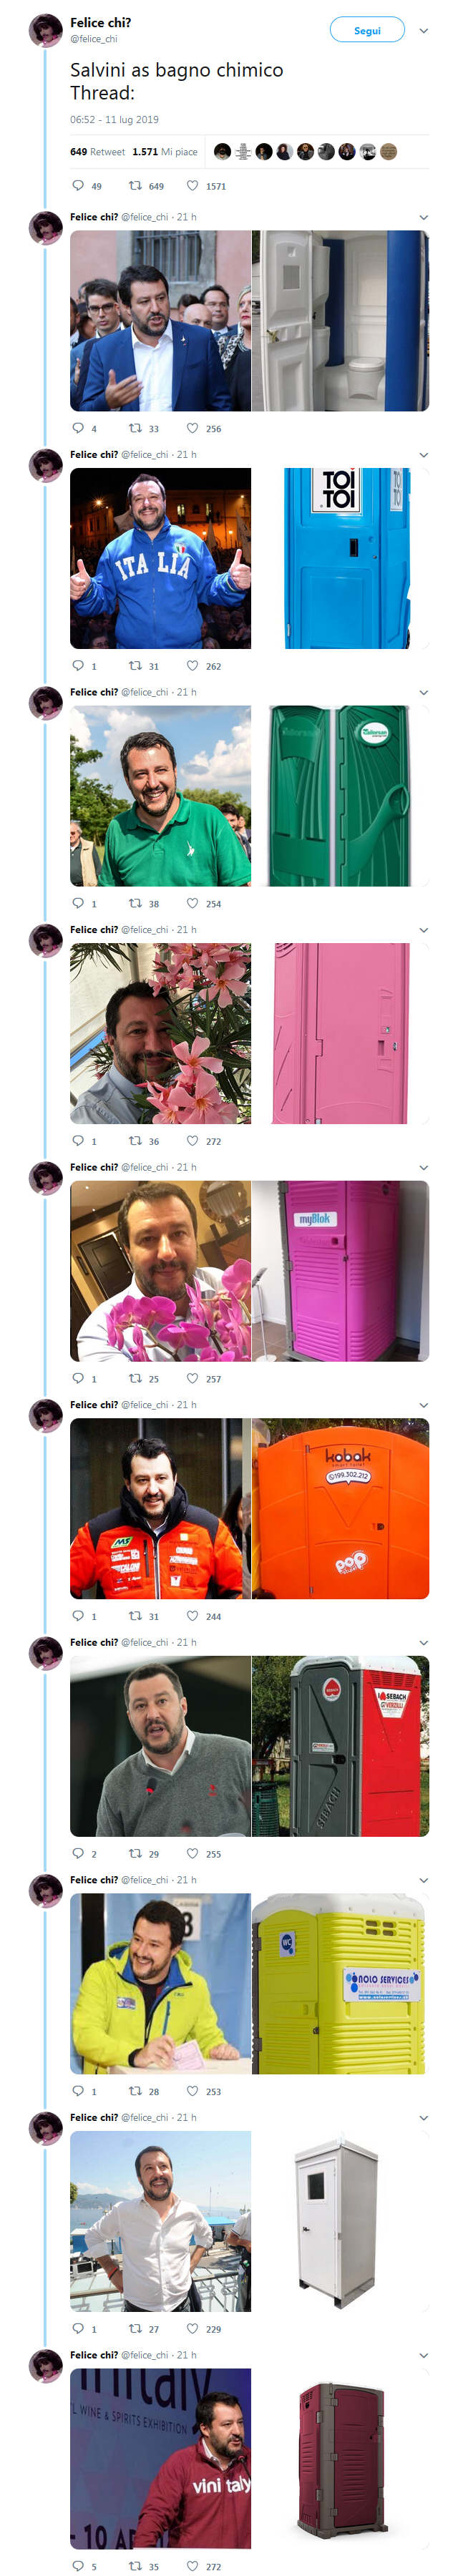 Salvini Cesso